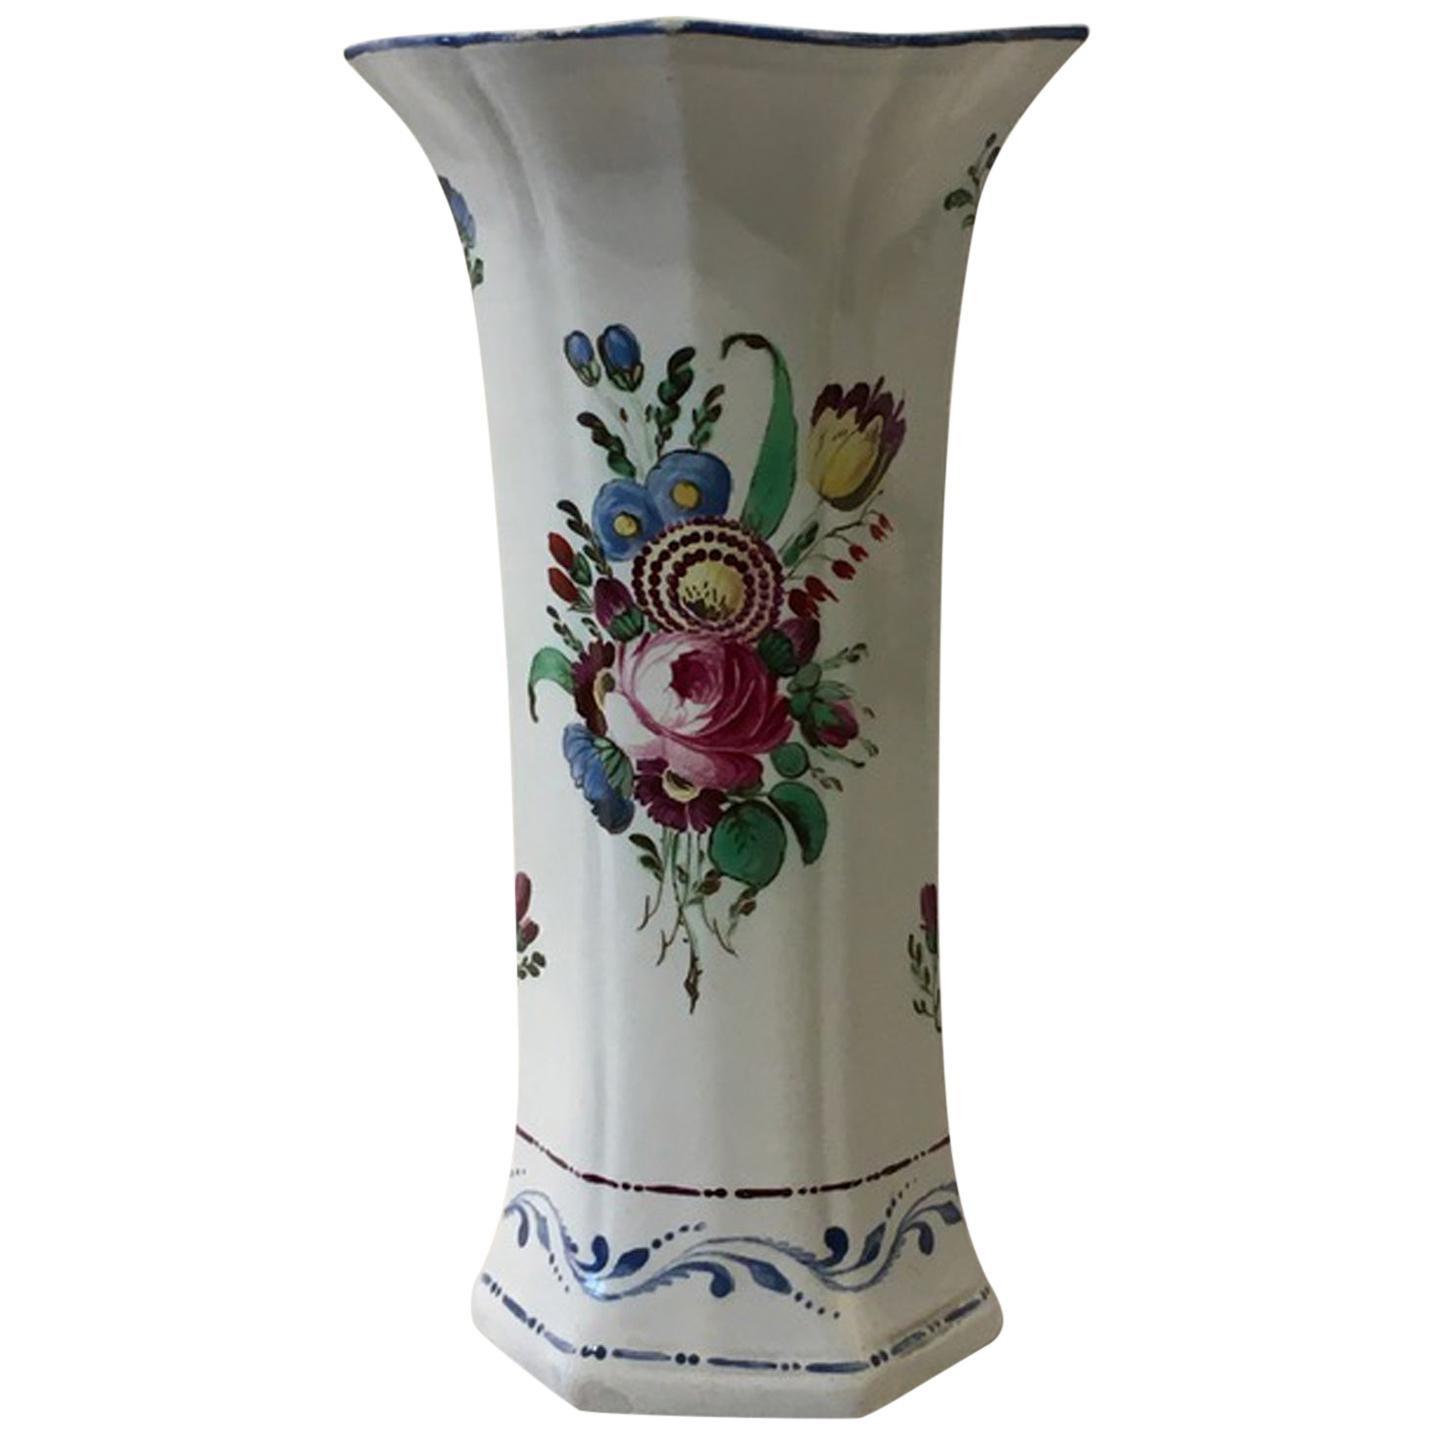 Italy Richard Ginori Doccia Early 18th Century Porcelain Vase